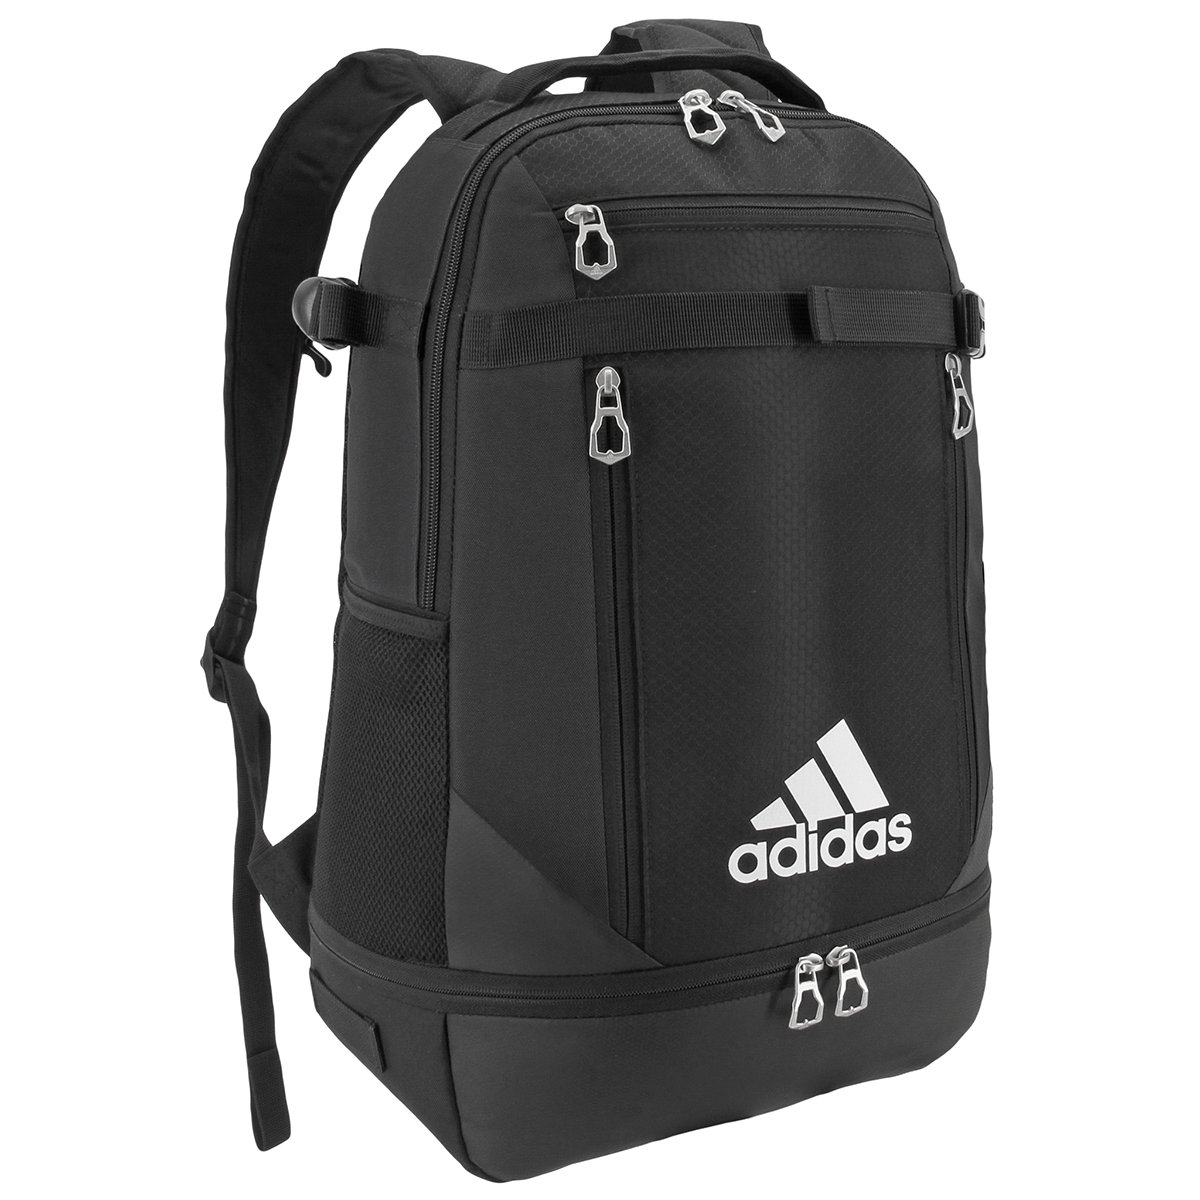 adidas Utility Team Backpack by adidas